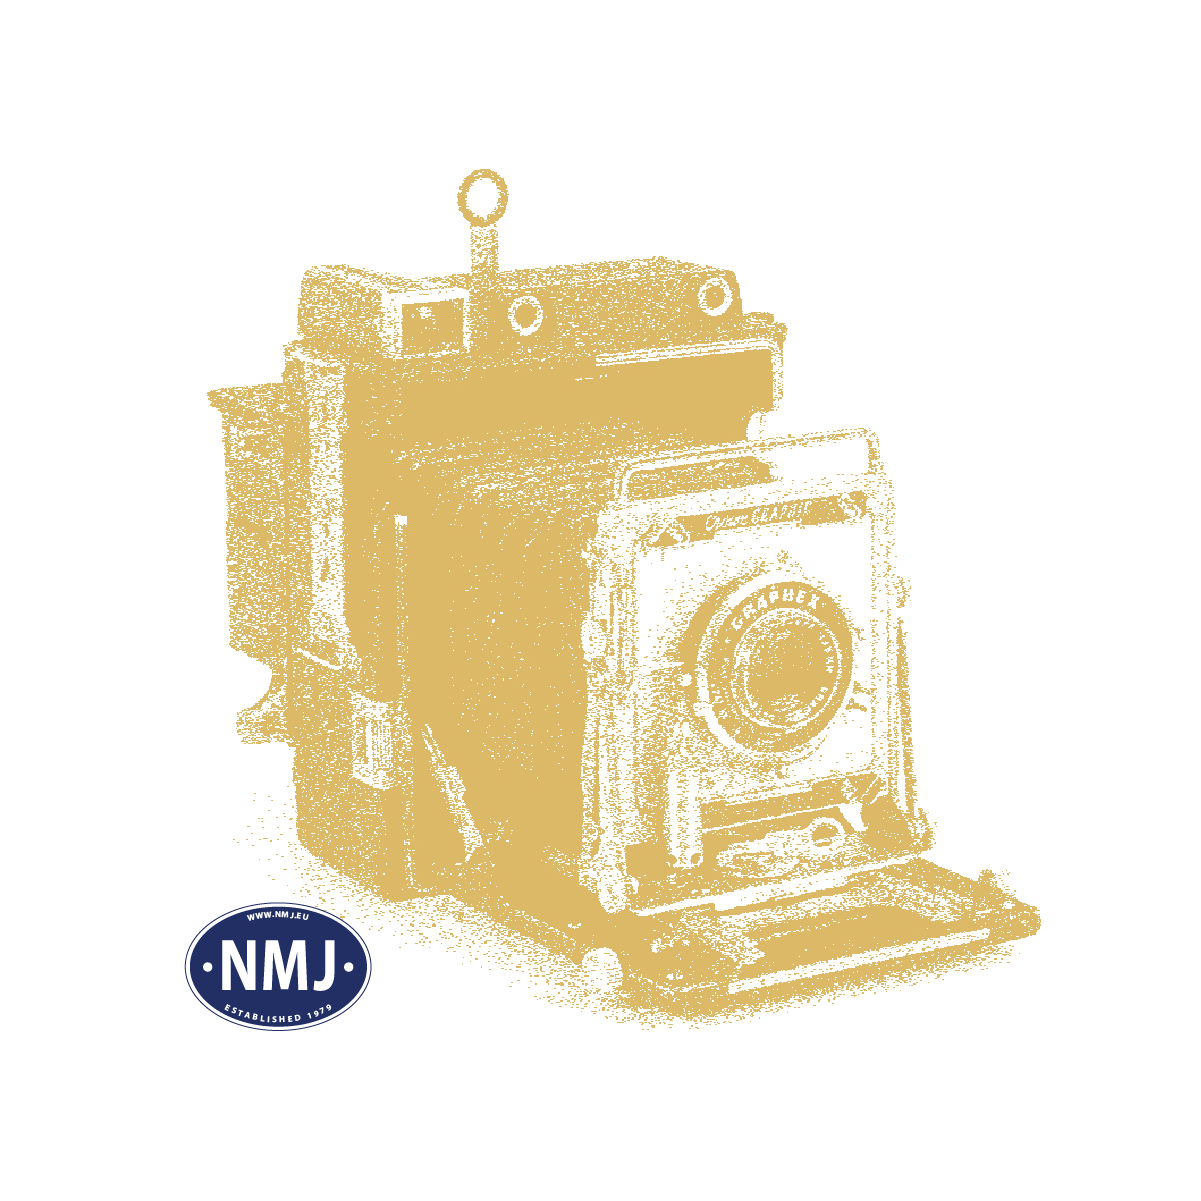 WODJP5594 - HO Cool Convertible, Just Plug, Funksjonsmodell m/ lys